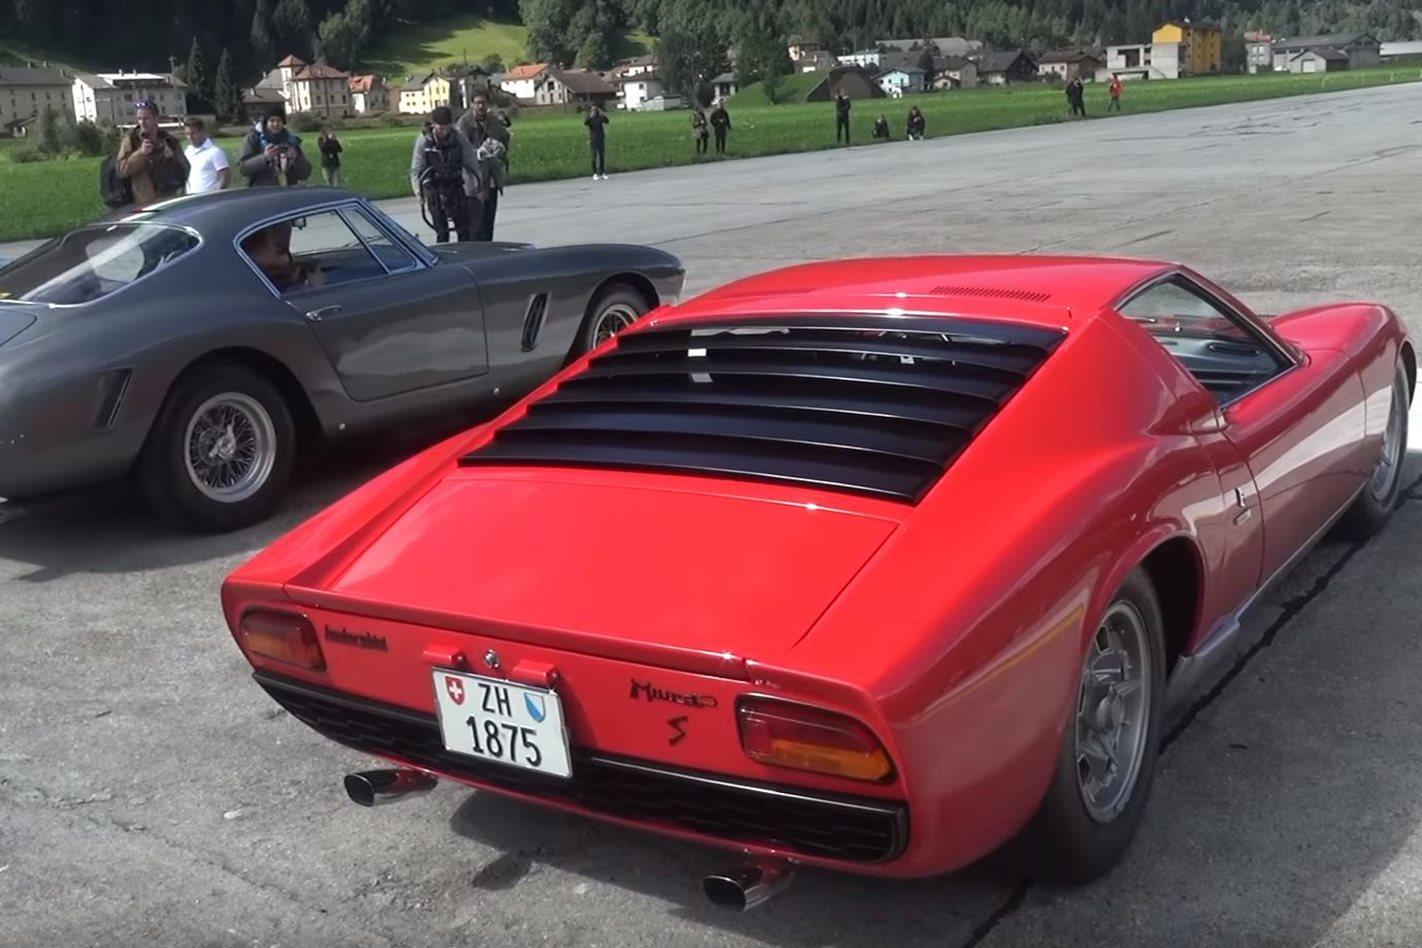 Ferrari 250 vs Lamborghini Miura